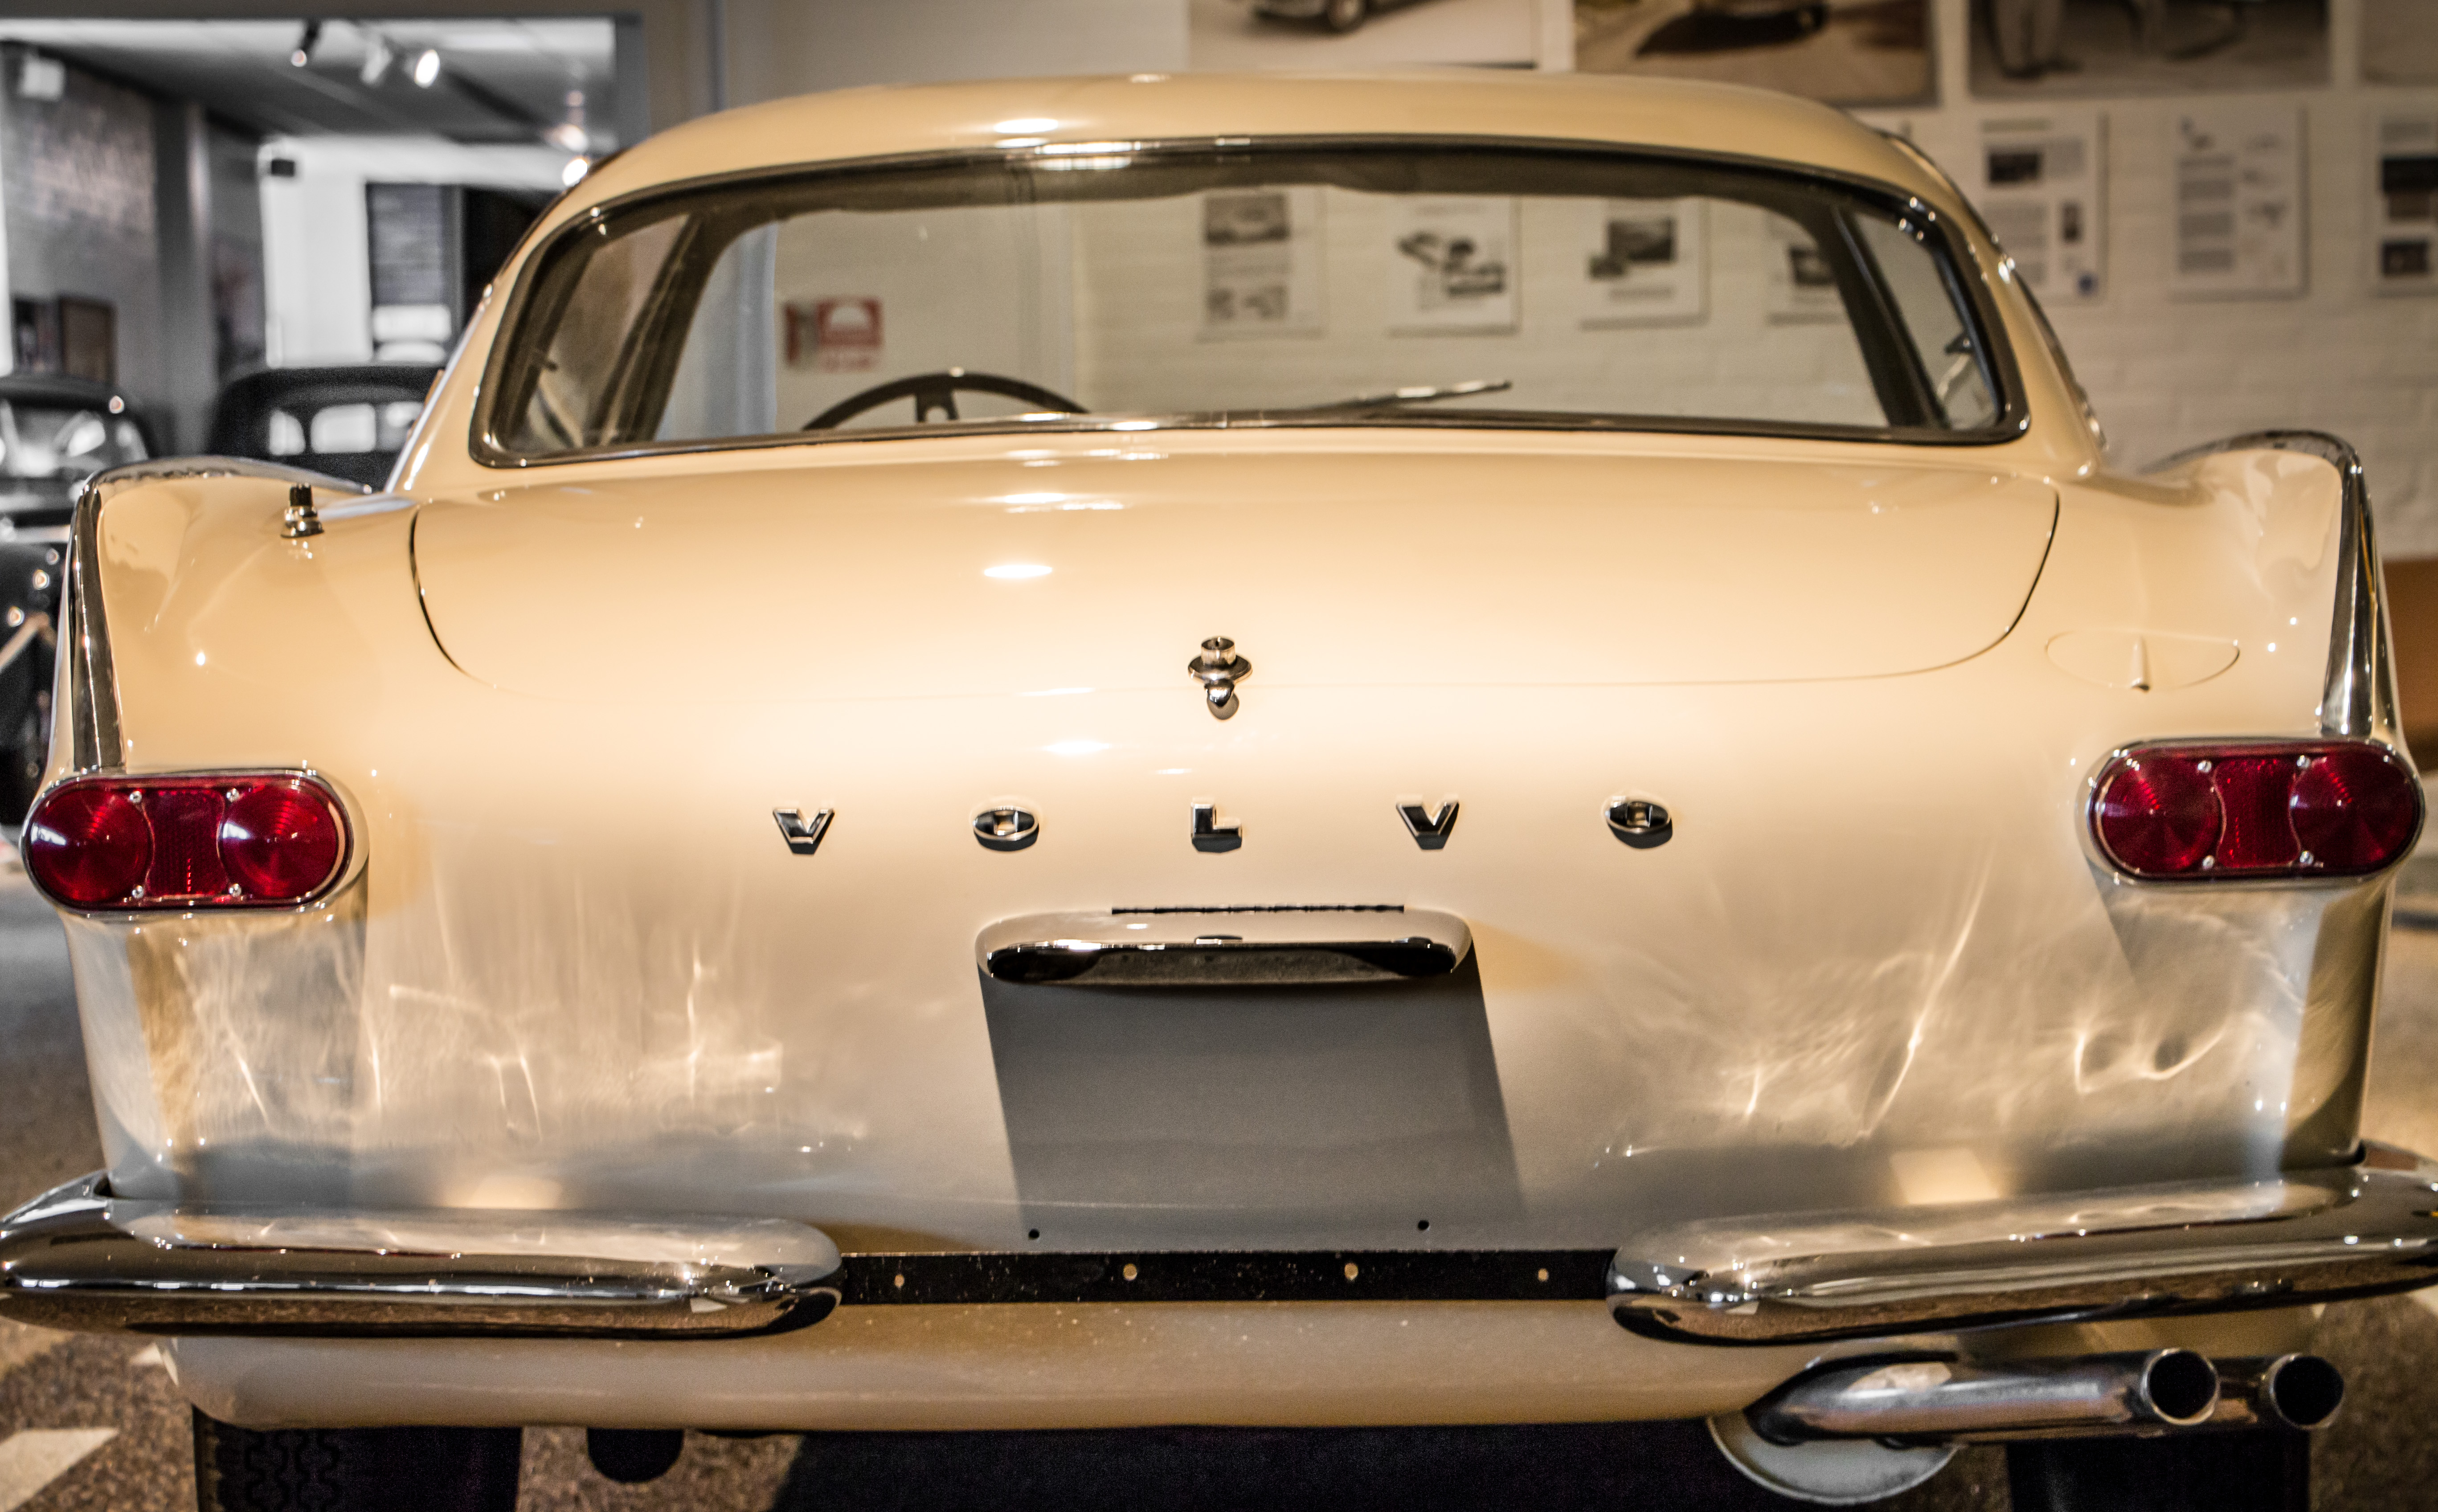 Classic Vlovo, Auto, Lights, Vintage, Theme, HQ Photo